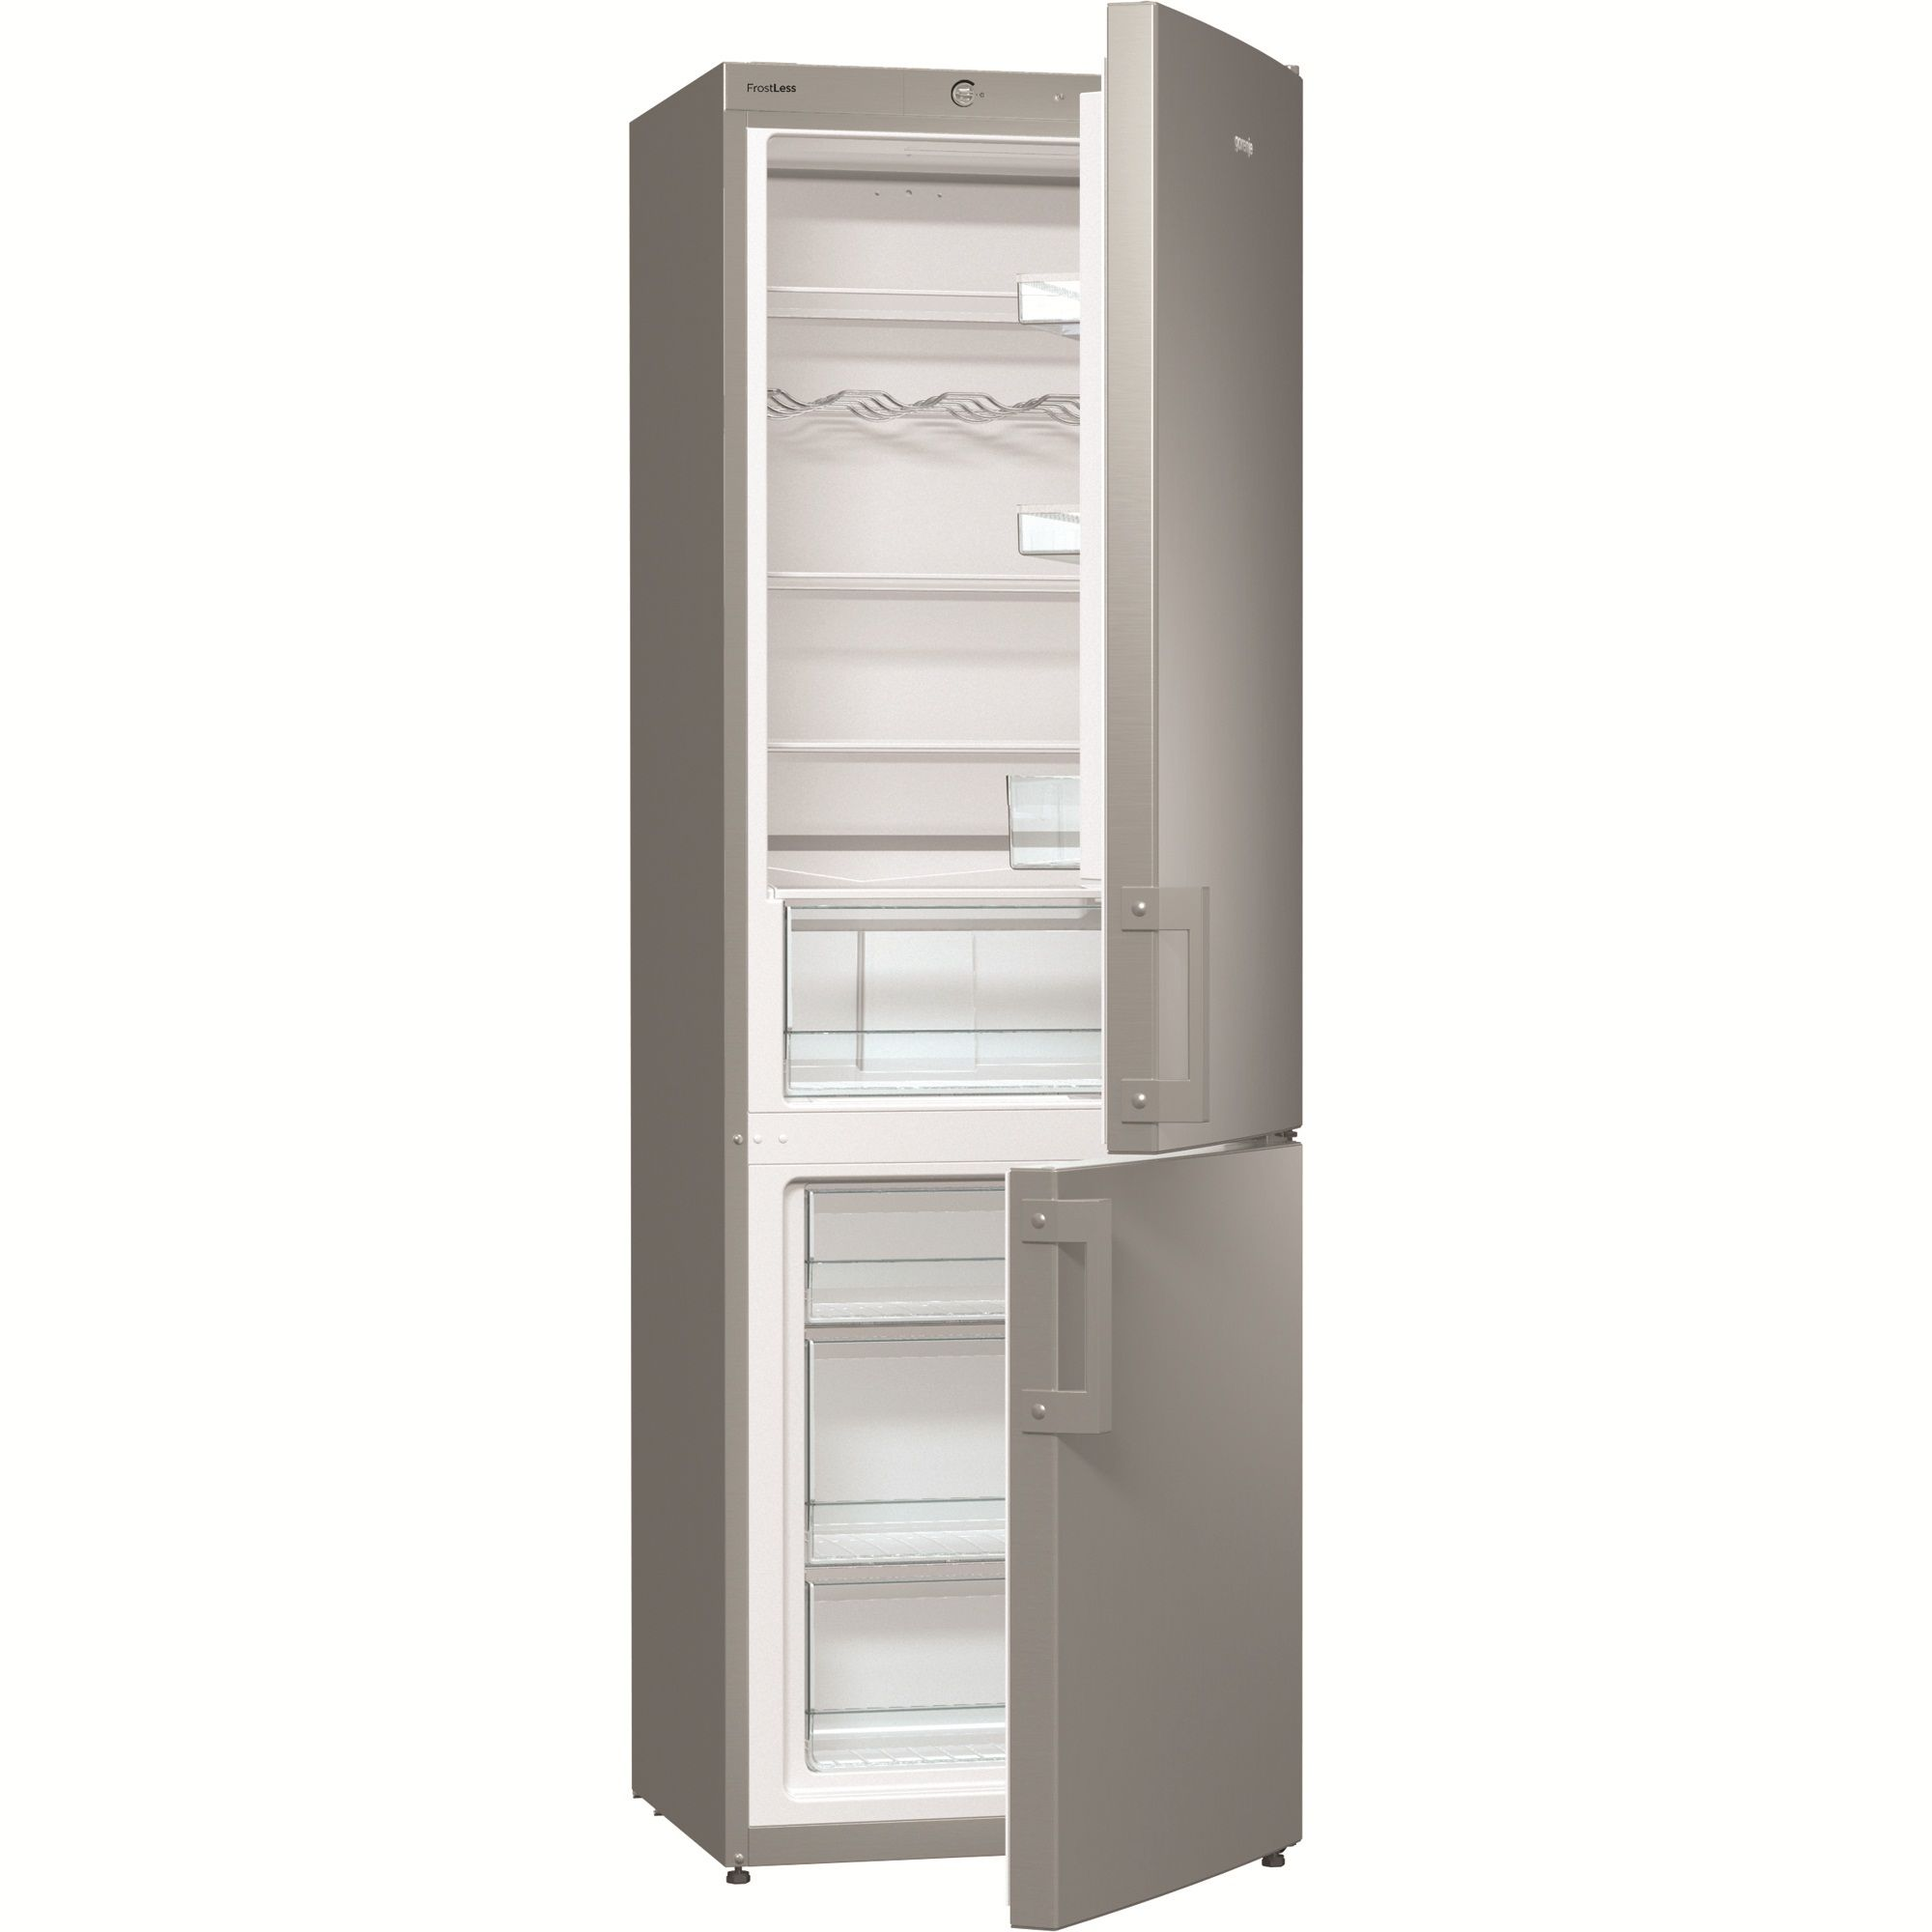 Хладилник с фризер Gorenje RK6191AX, 321 л, Клас A+, 185 см, Сребрист